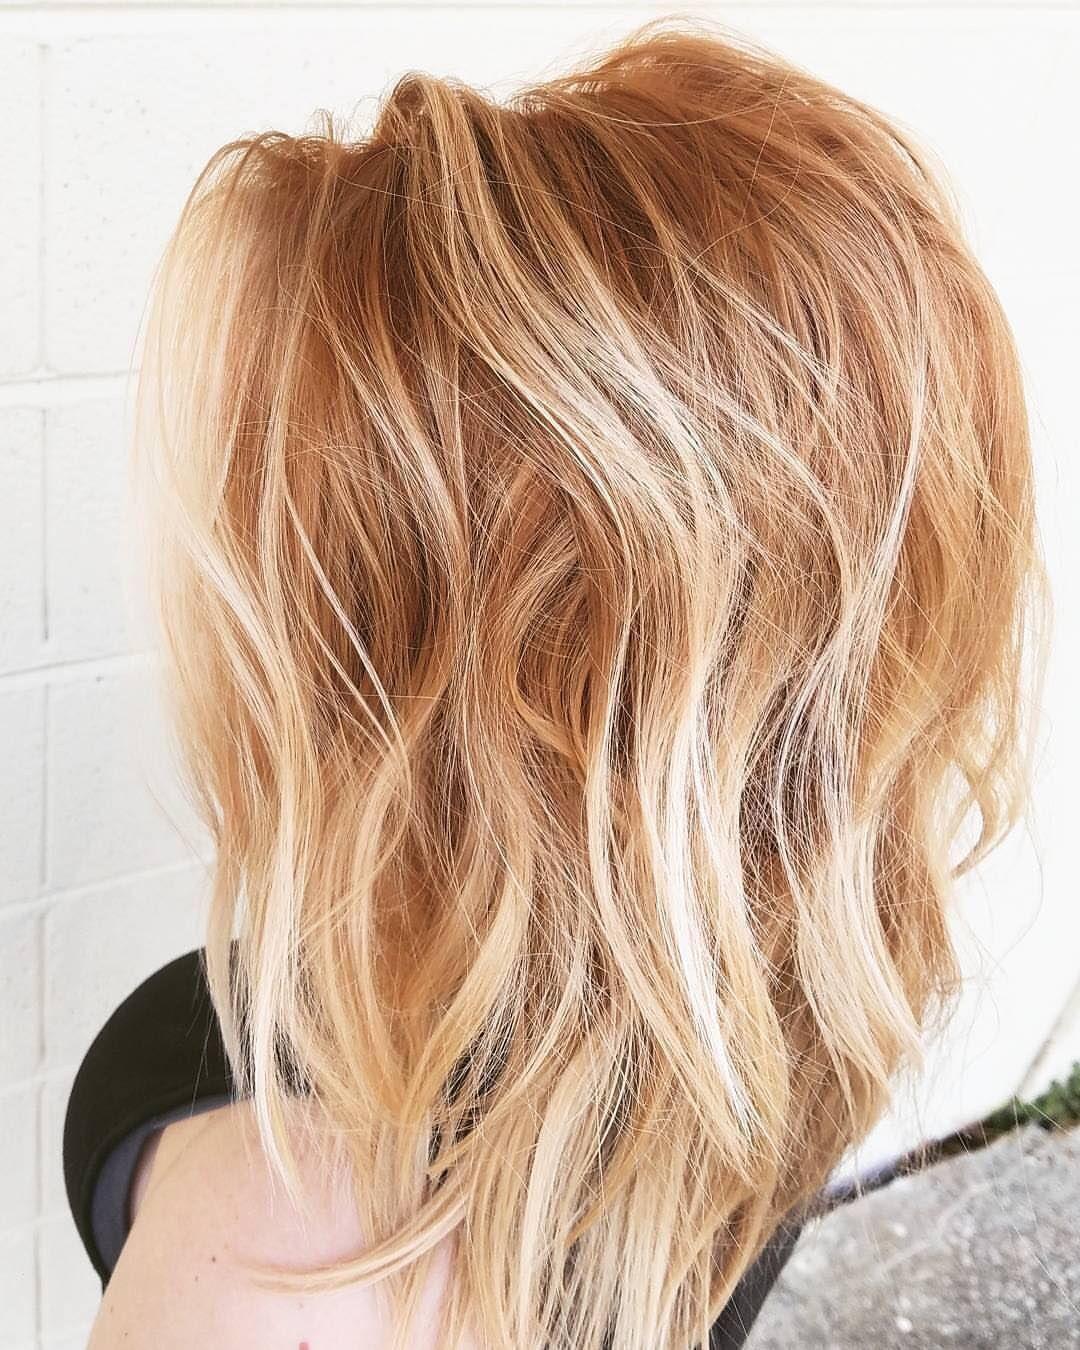 99 Wonderful Strawberry Blonde Hairstyles 2020 In 2020 Strawberry Blonde Hair Color Strawberry Blonde Highlights Red Blonde Hair